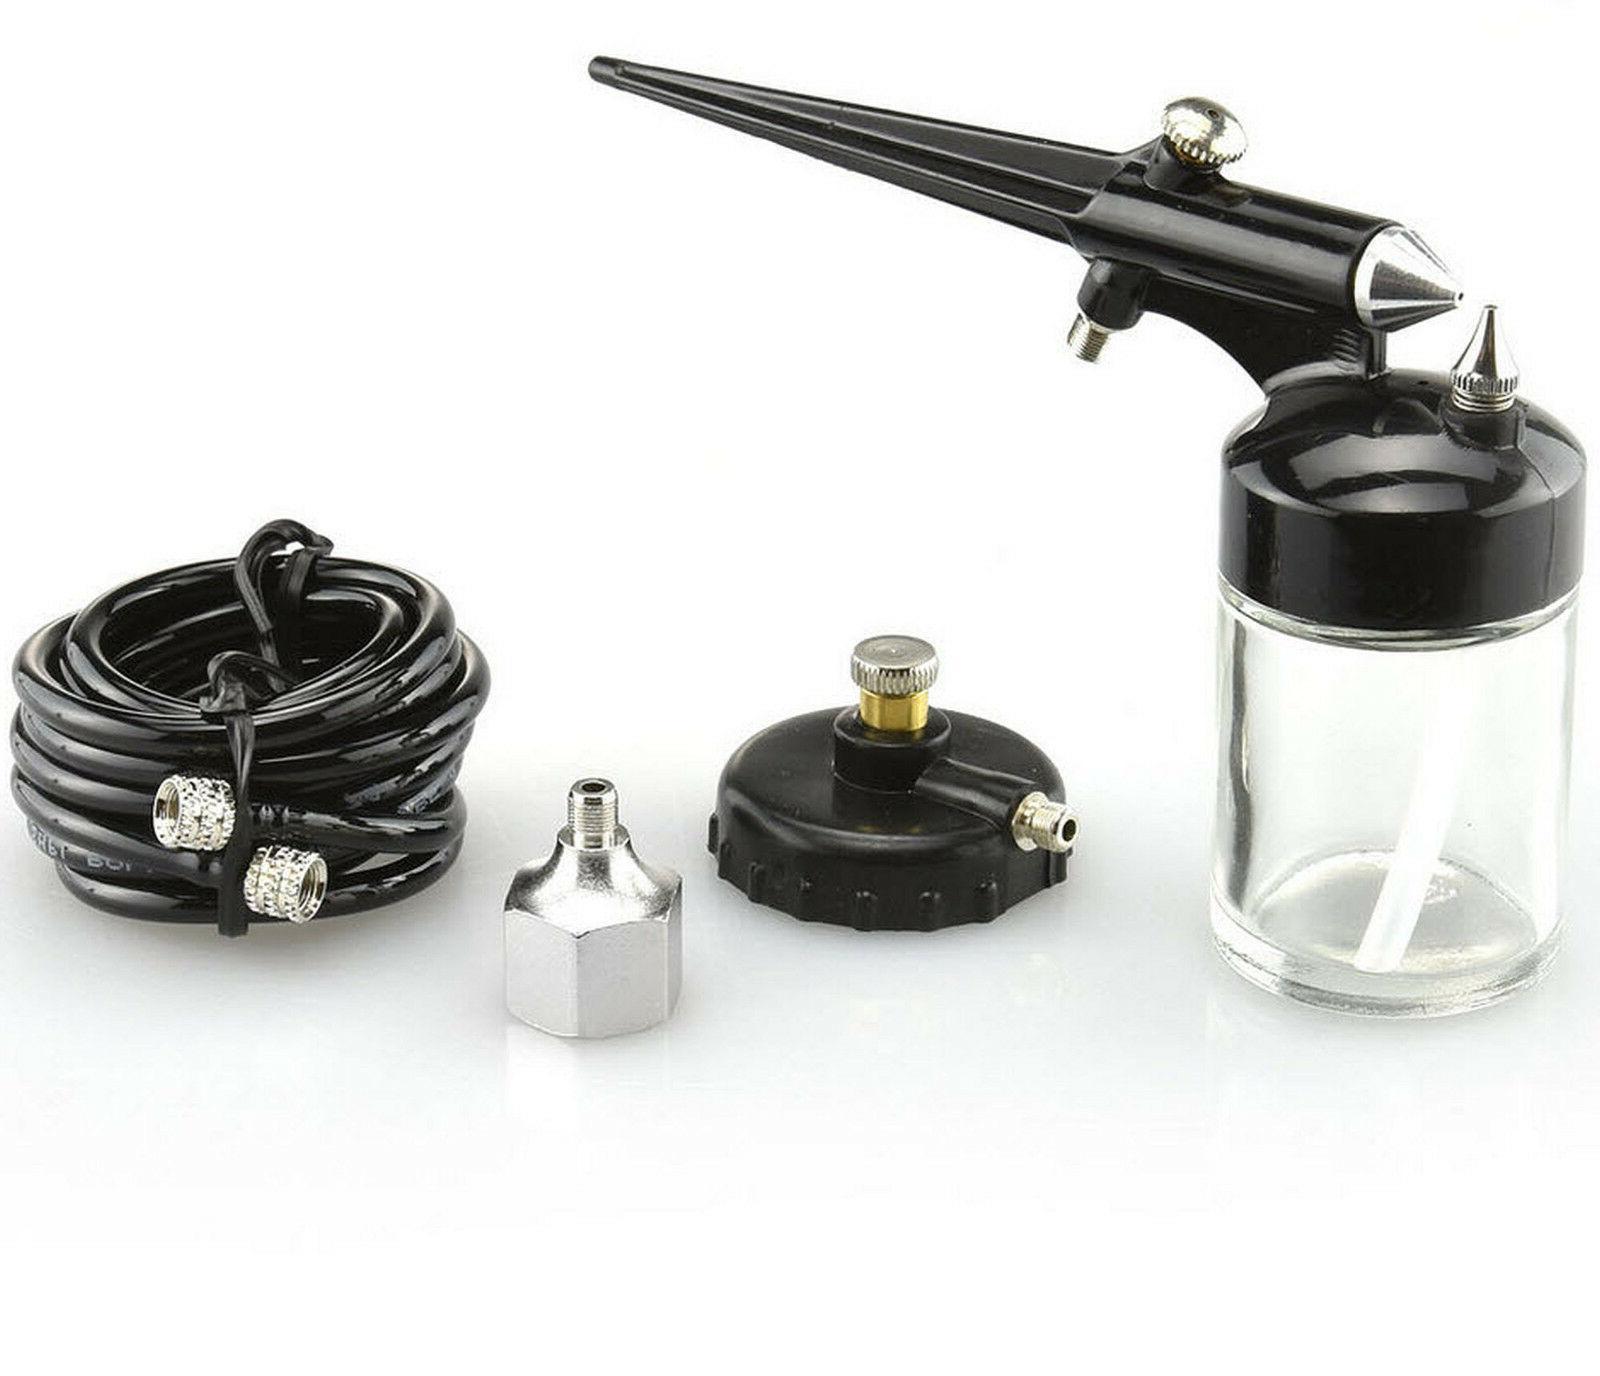 Brush Hobby Propellent Operates 15-50 PSI